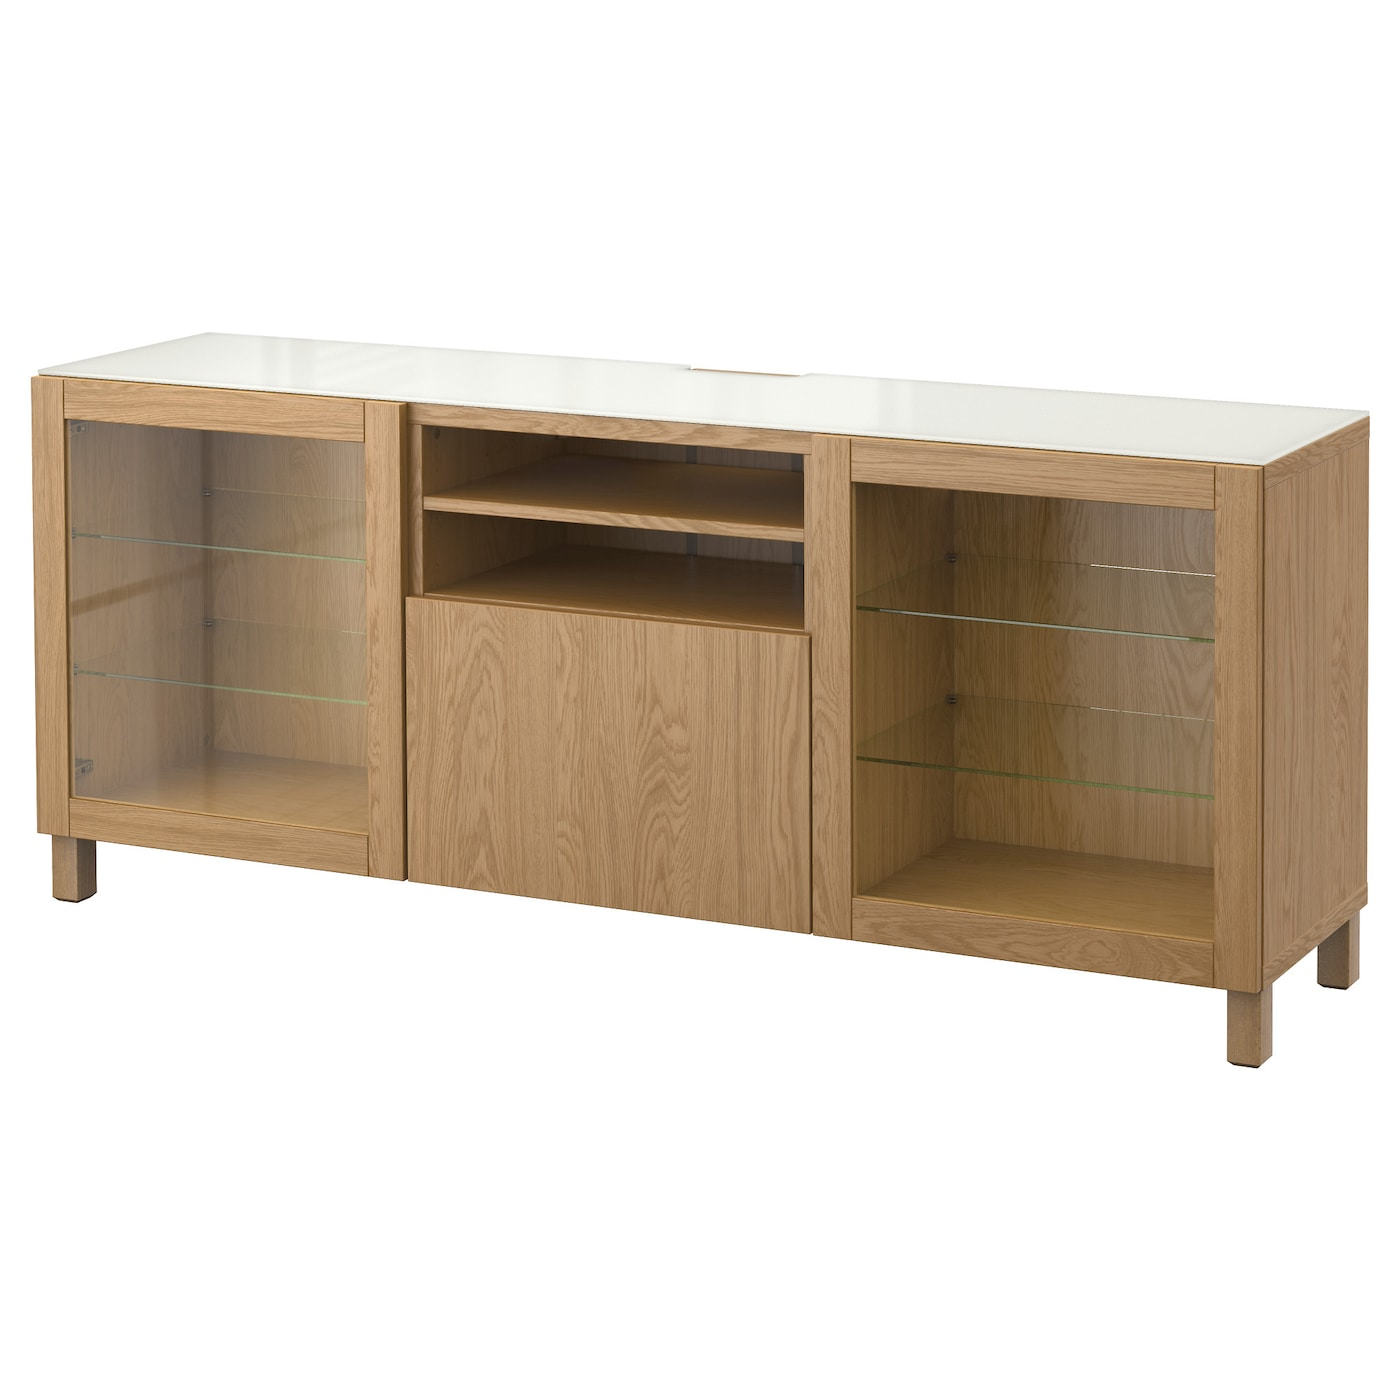 best tv bench lappviken sindvik oak effect clear glass 180x40x74 cm ikea. Black Bedroom Furniture Sets. Home Design Ideas